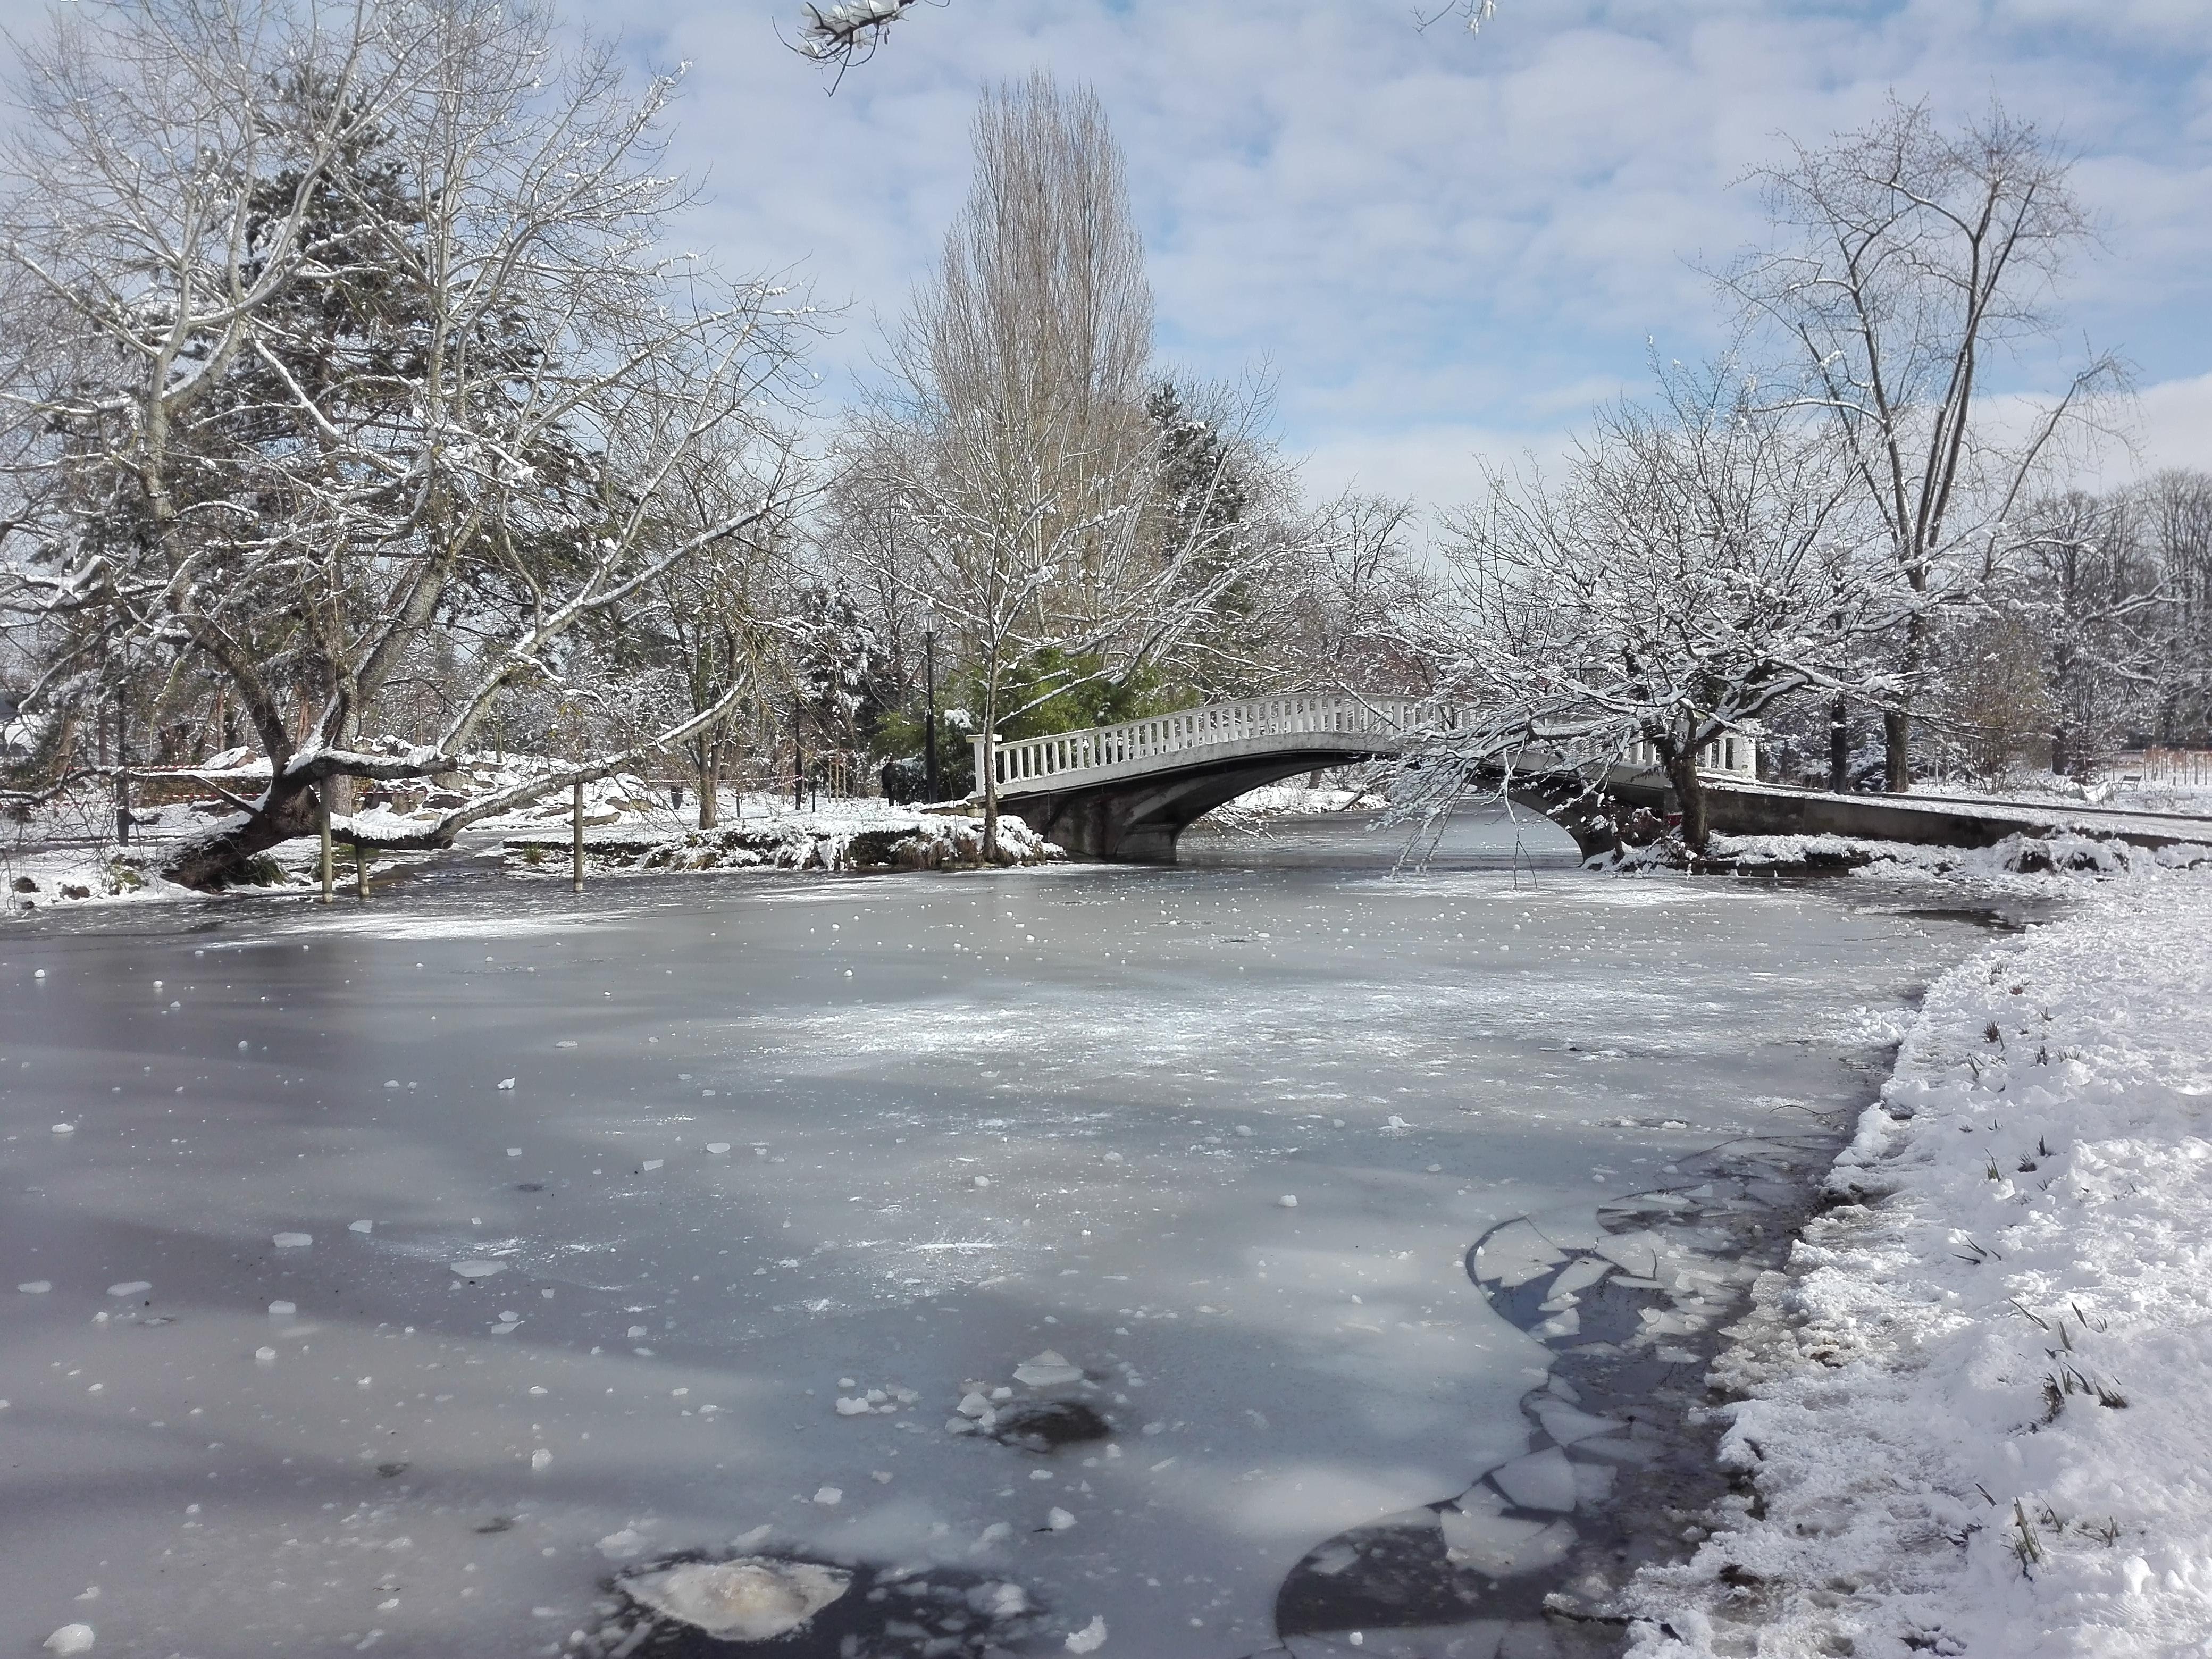 Les Ibis gel et neige 02 2018